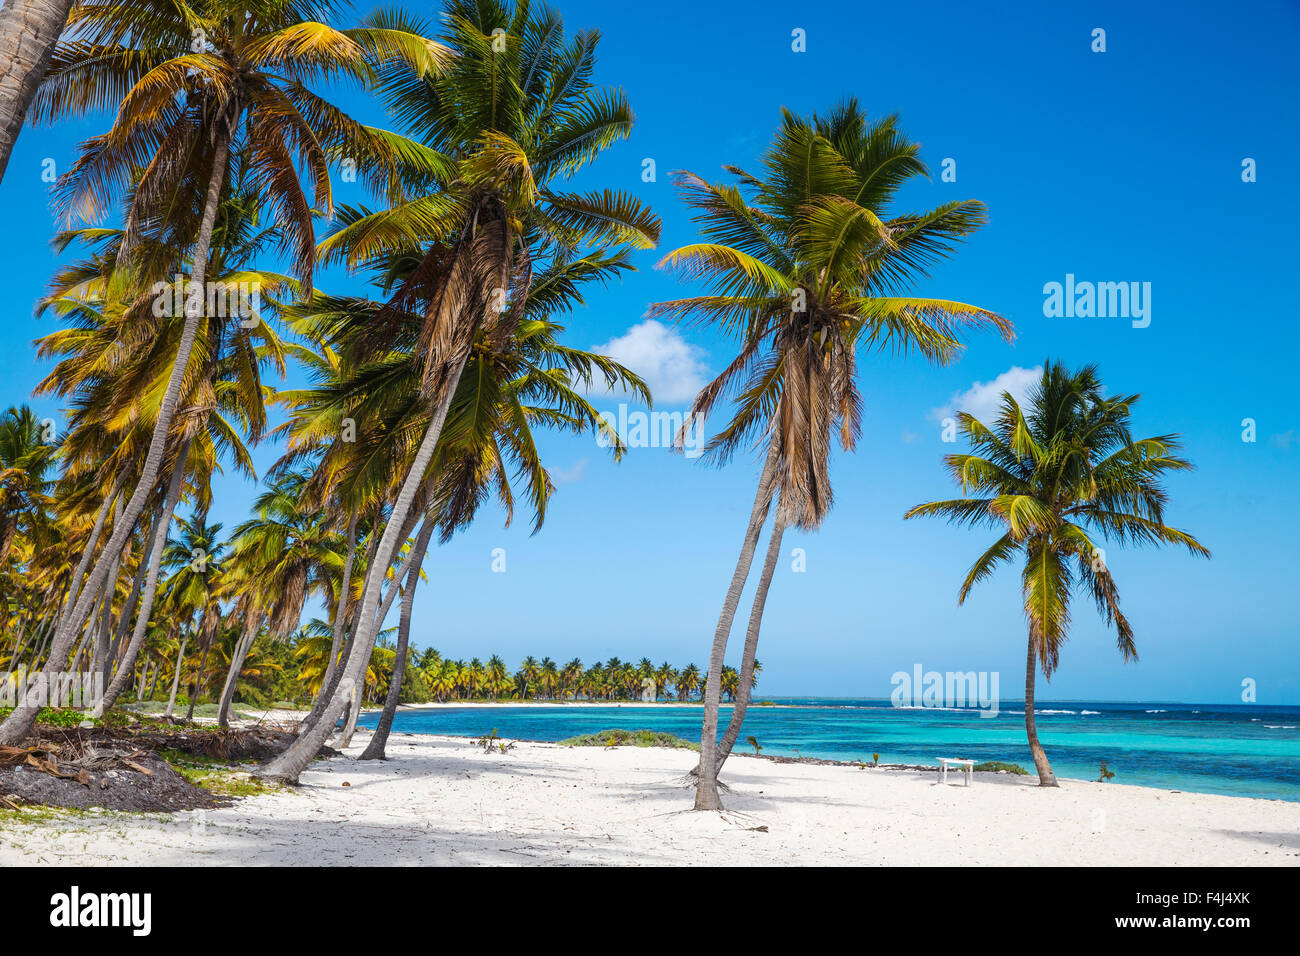 Canto de la Playa, Saona Island, Parque Nacional del Este, Punta Cana, Repubblica Dominicana, West Indies, dei Caraibi Immagini Stock